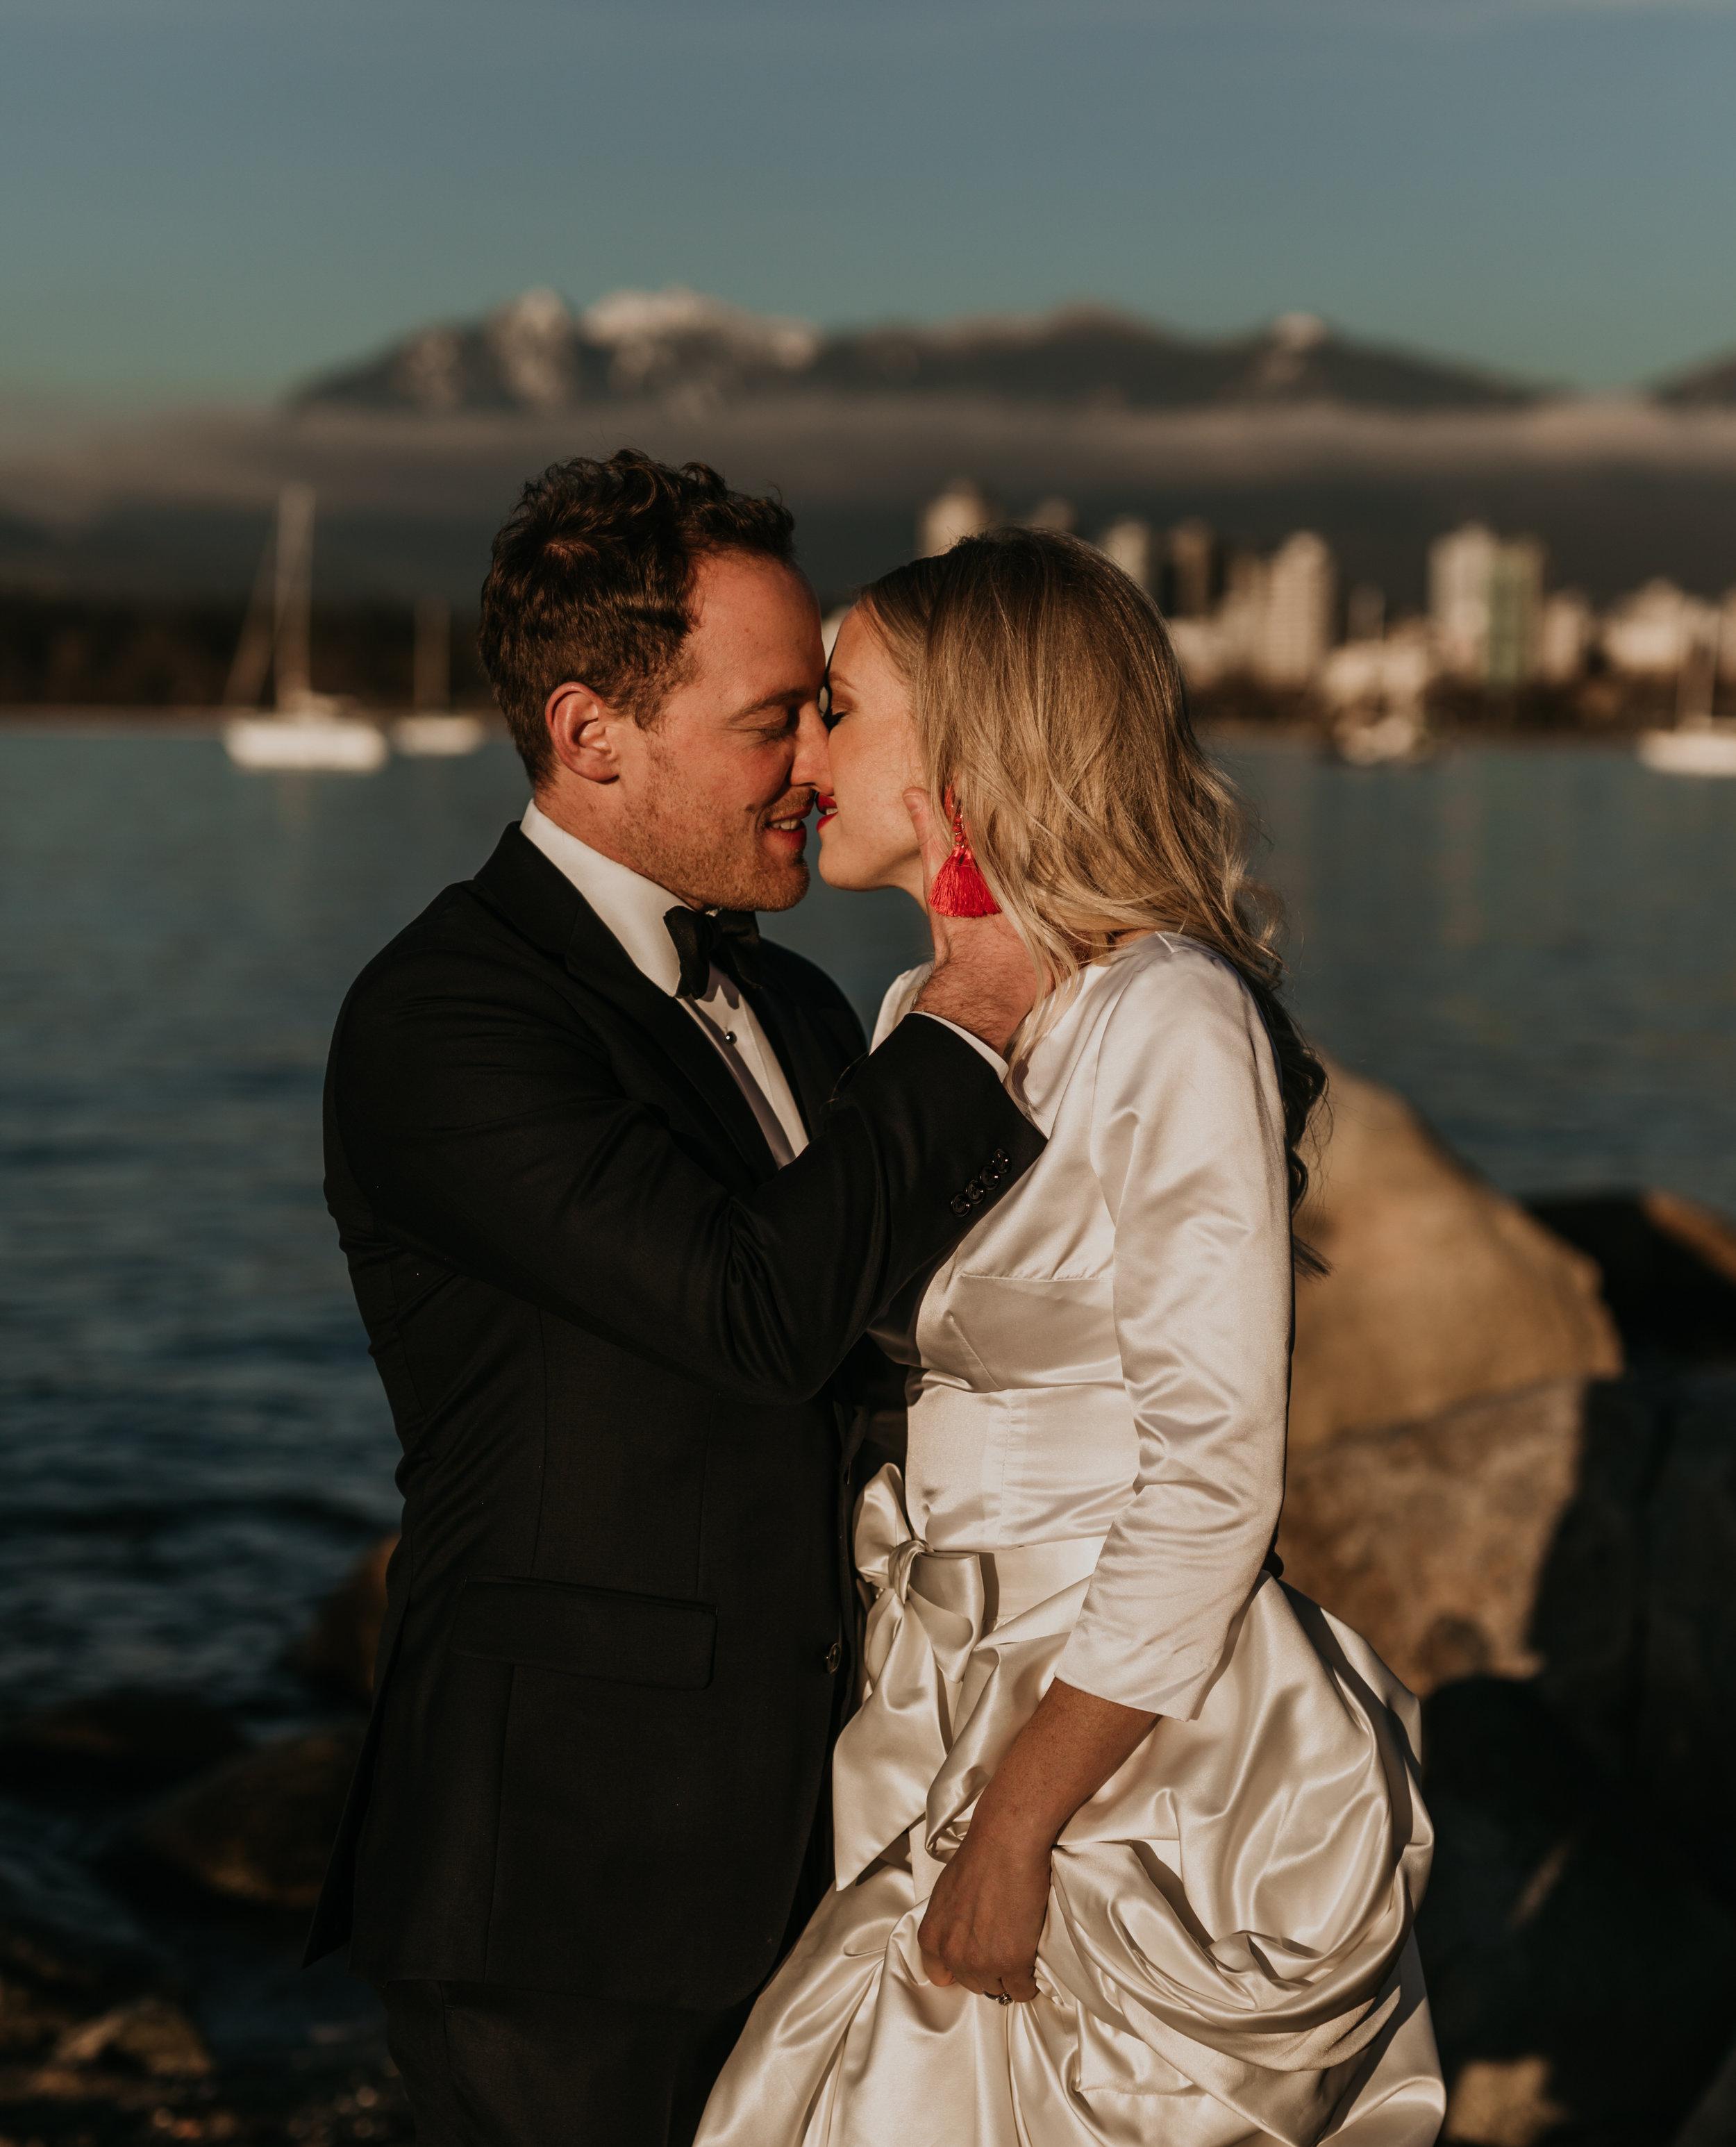 Vancouver Wedding Photos - Vegan Wedding Photographer - New Years Eve Wedding Photos - Vancouver Wedding Photographer - Vancouver Wedding Videographer - 640.JPG